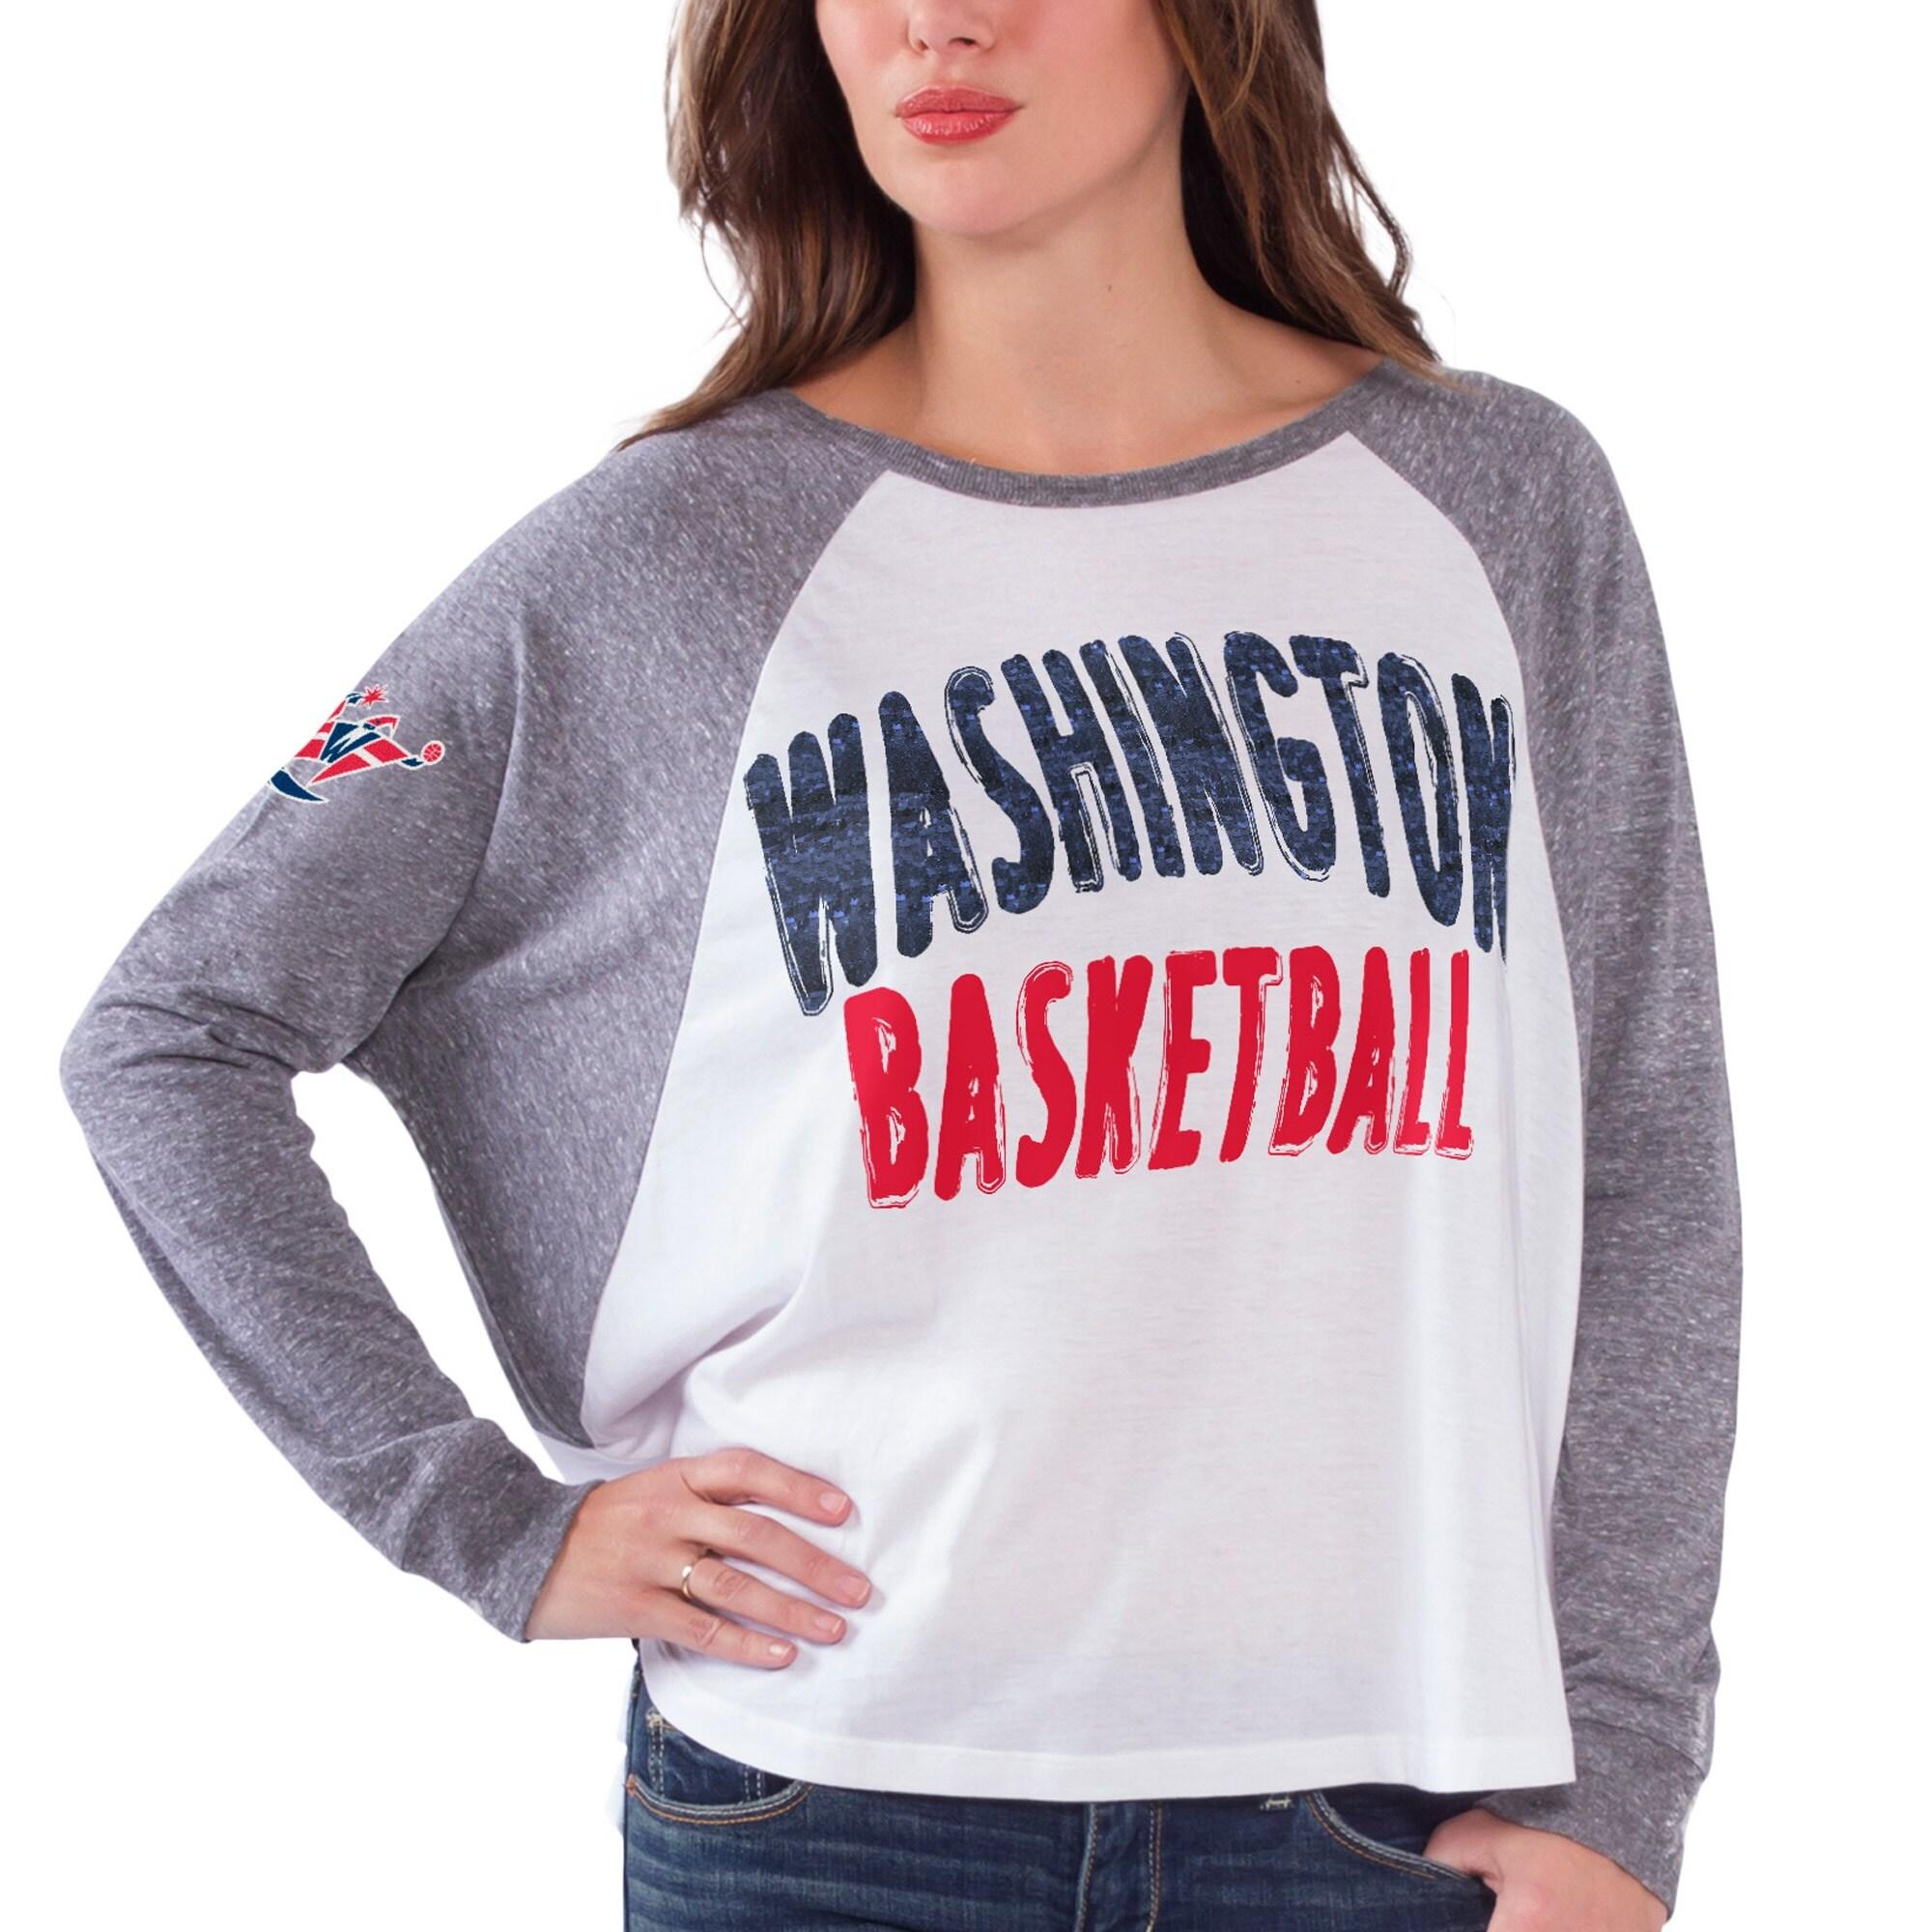 Washington Wizards Women's Triple A Long Sleeve T-Shirt - White/Gray